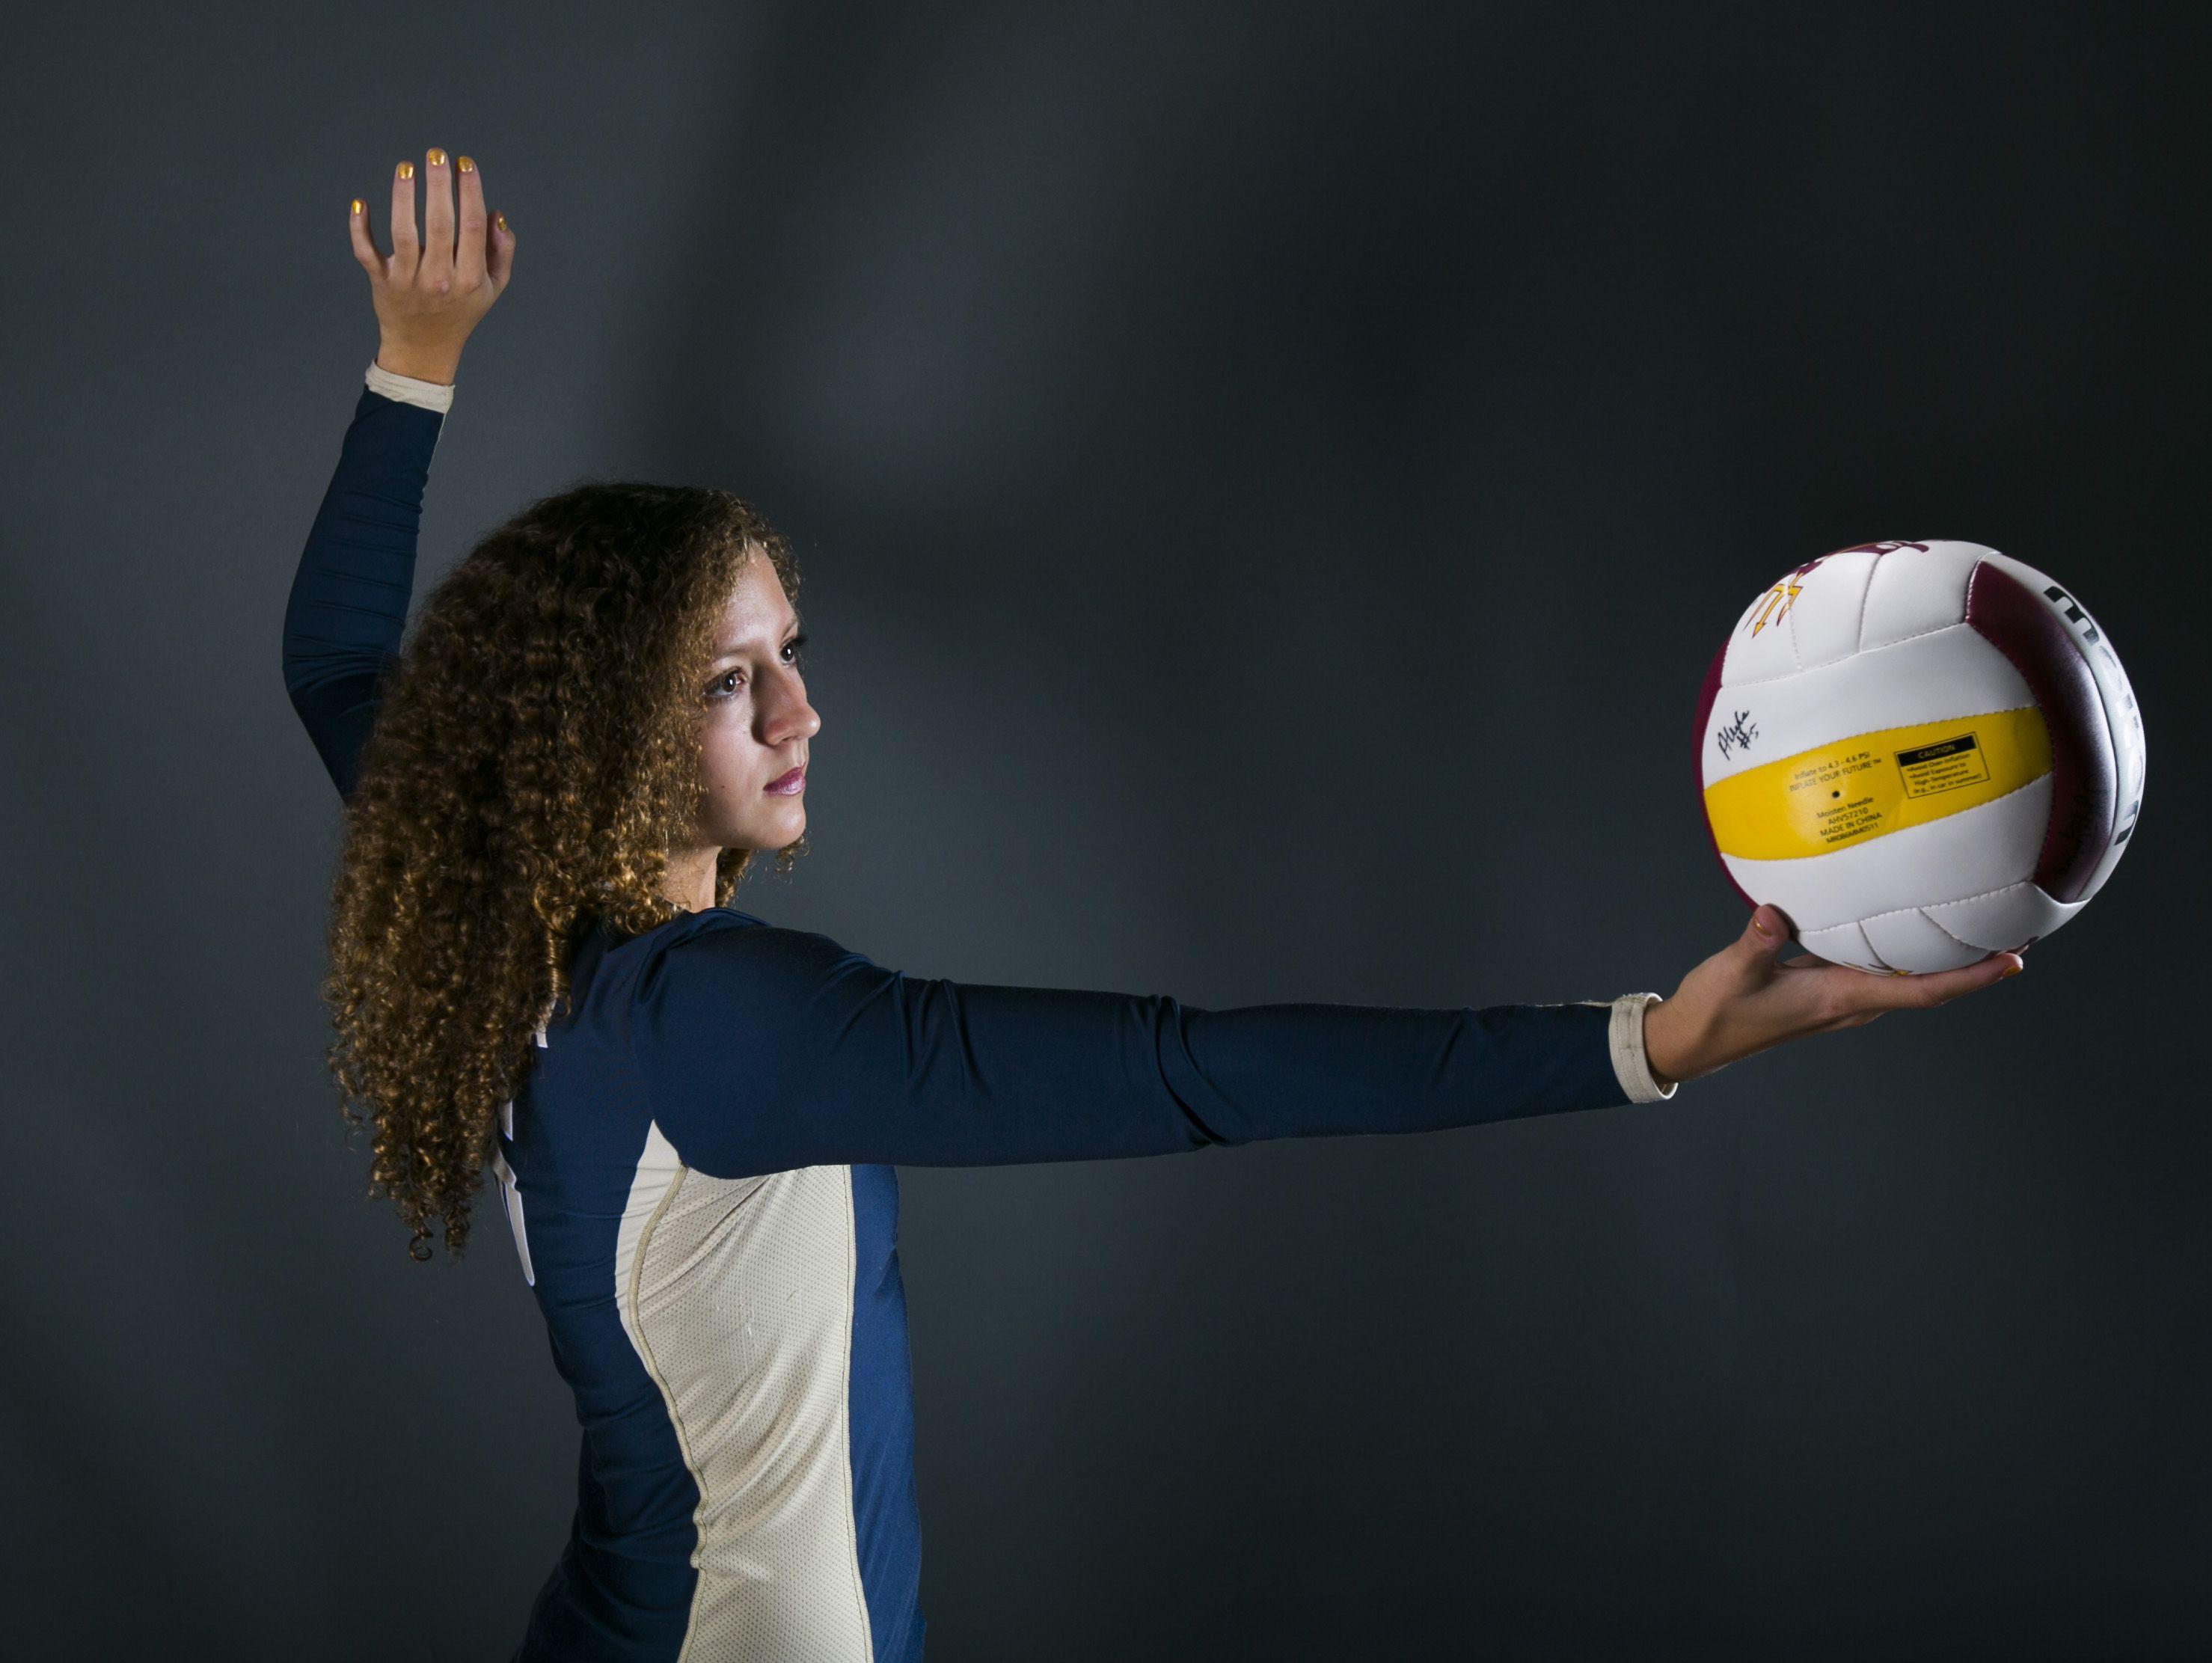 Phoenix Desert Vista's Olivia Fairchild is azcentral sports' runner-up October Athlete of the Month.